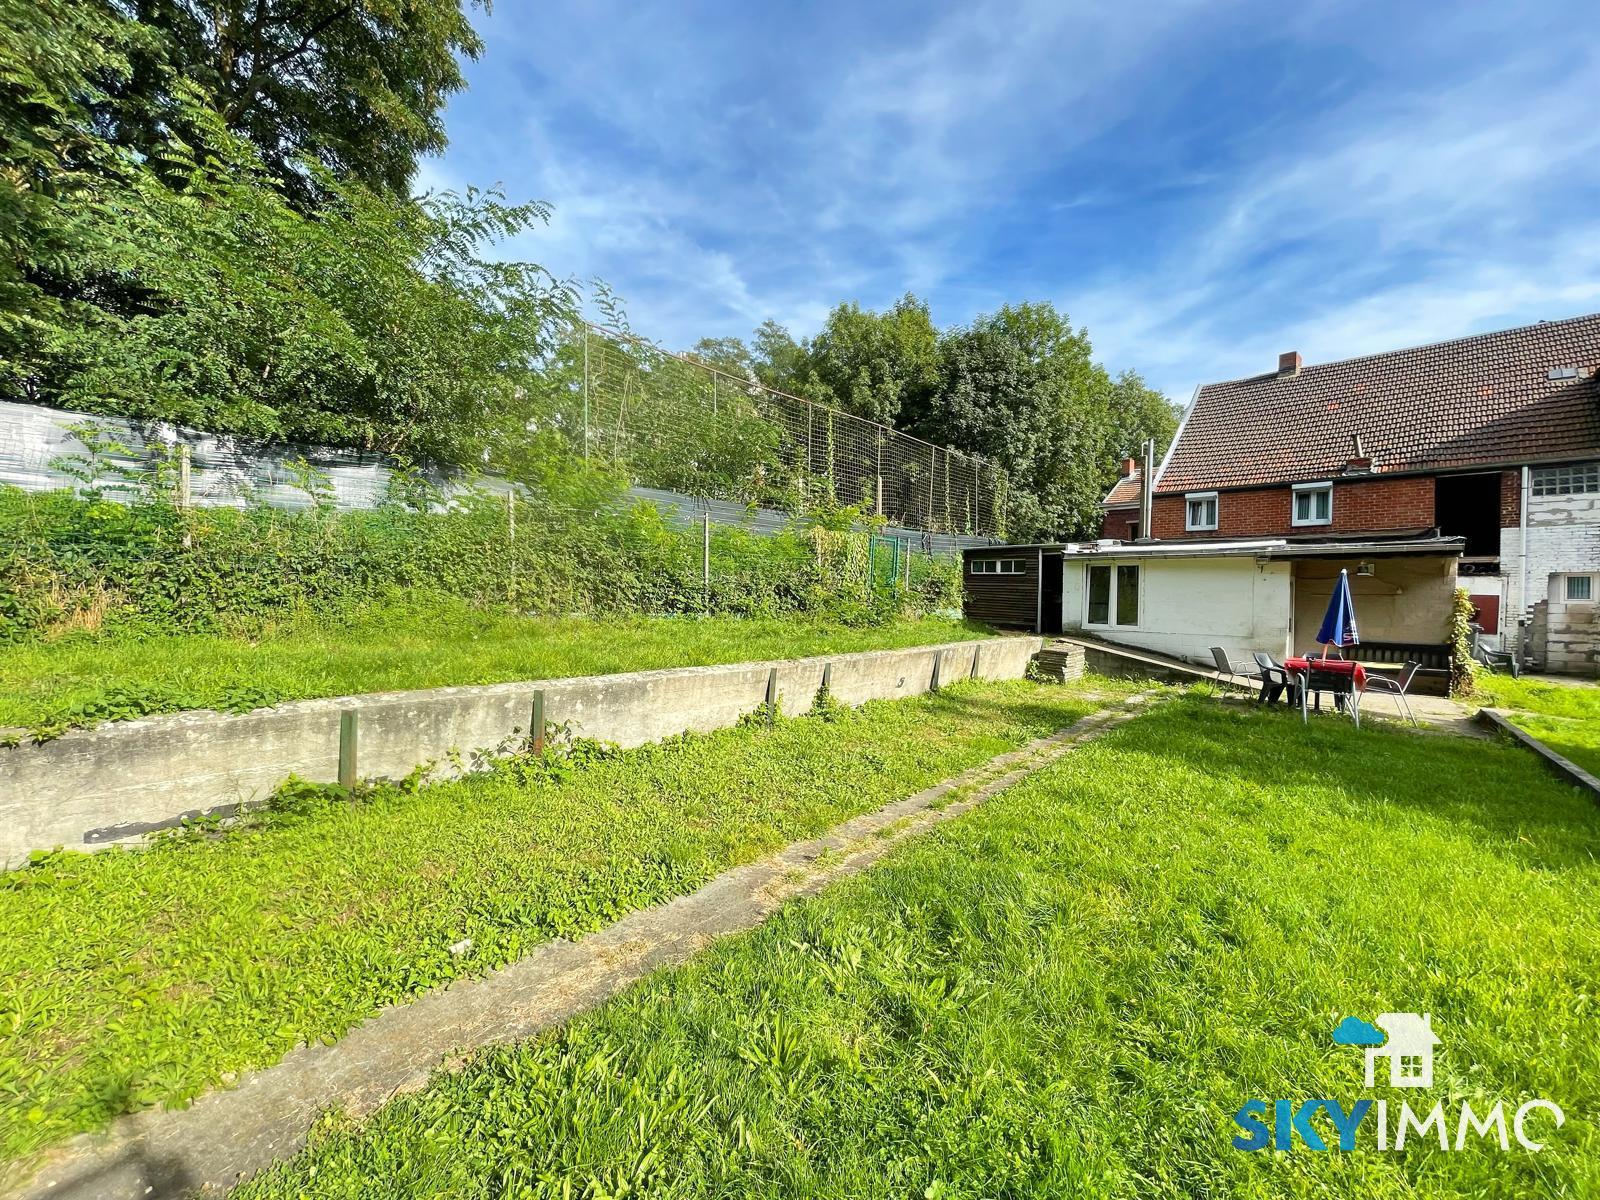 Maison - Seraing Jemeppesur-Meuse - #4517380-18